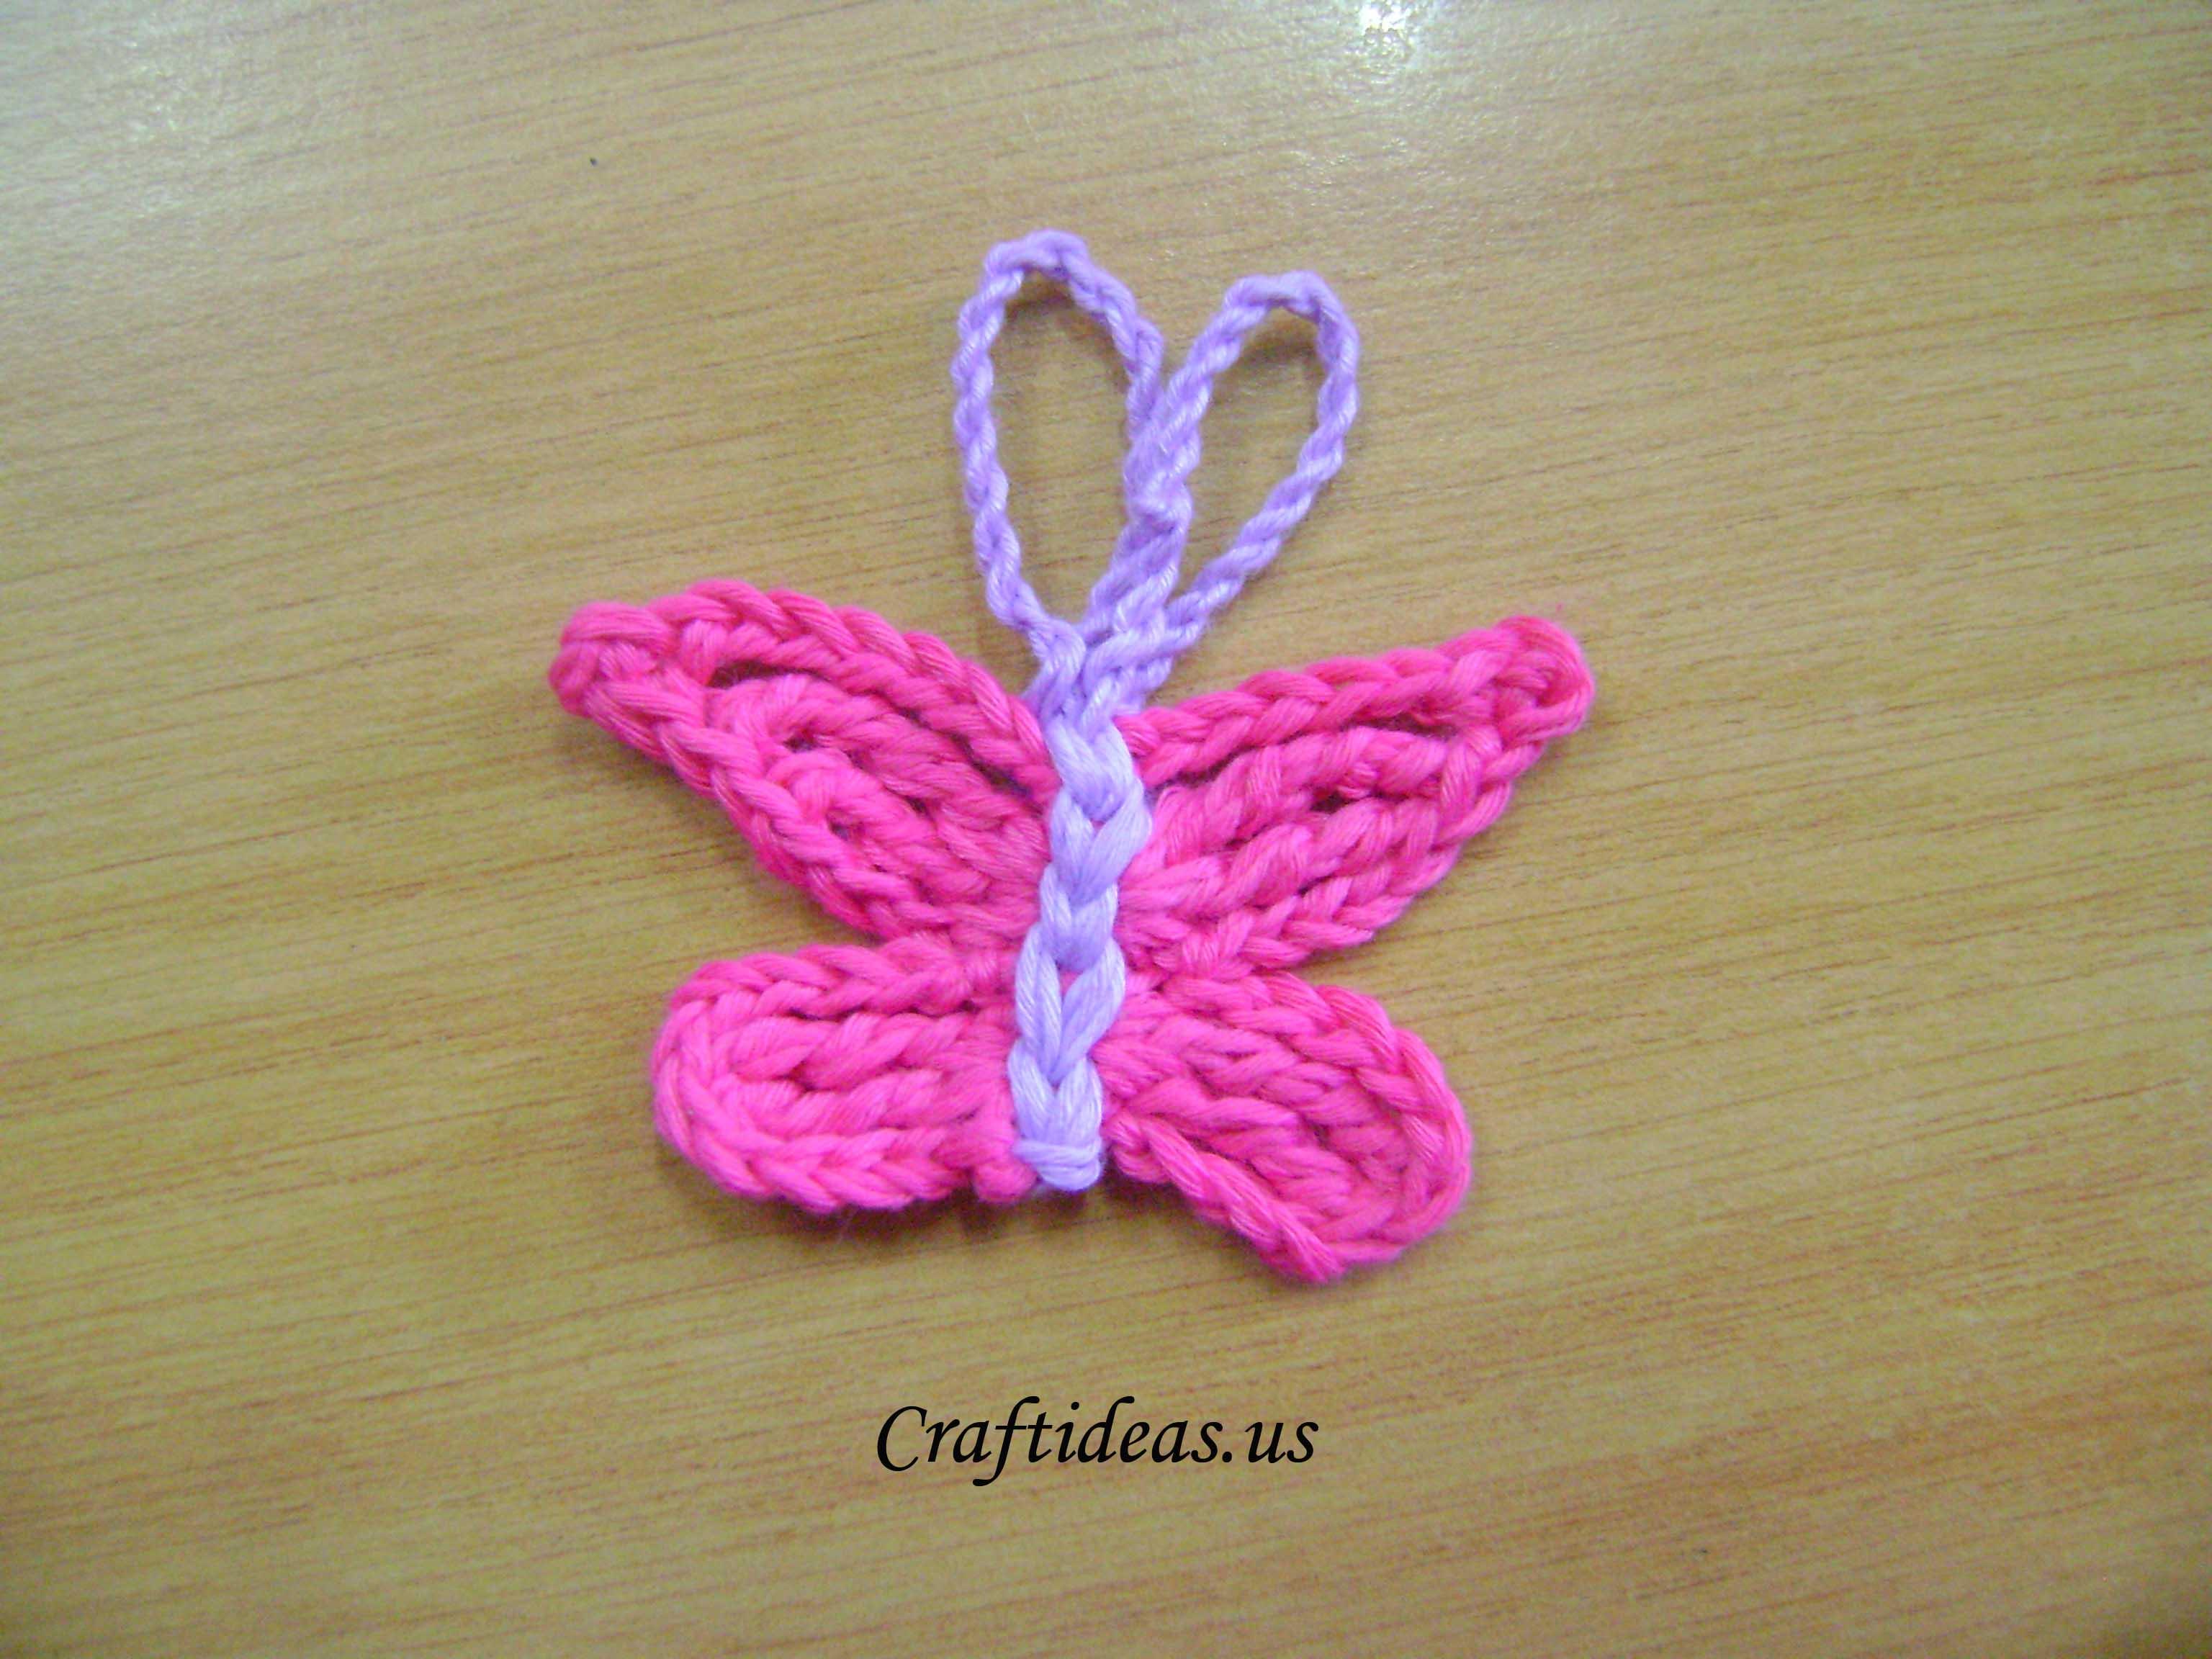 Crochet butterfly tutorial - Craft Ideas